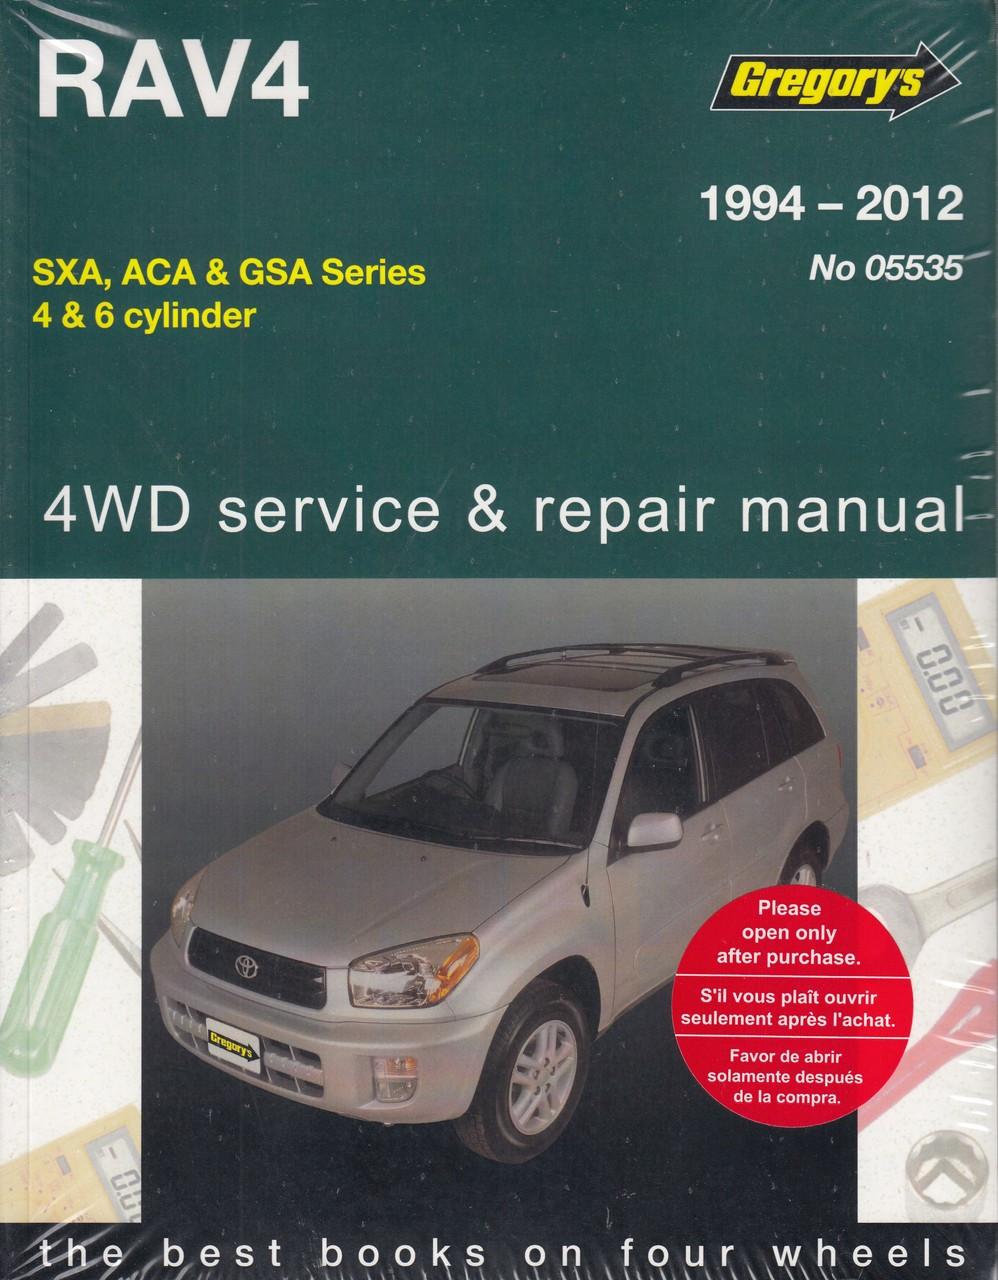 92 Toyota 3 0 V6 Engine Diagram Free Download Wiring Diagram